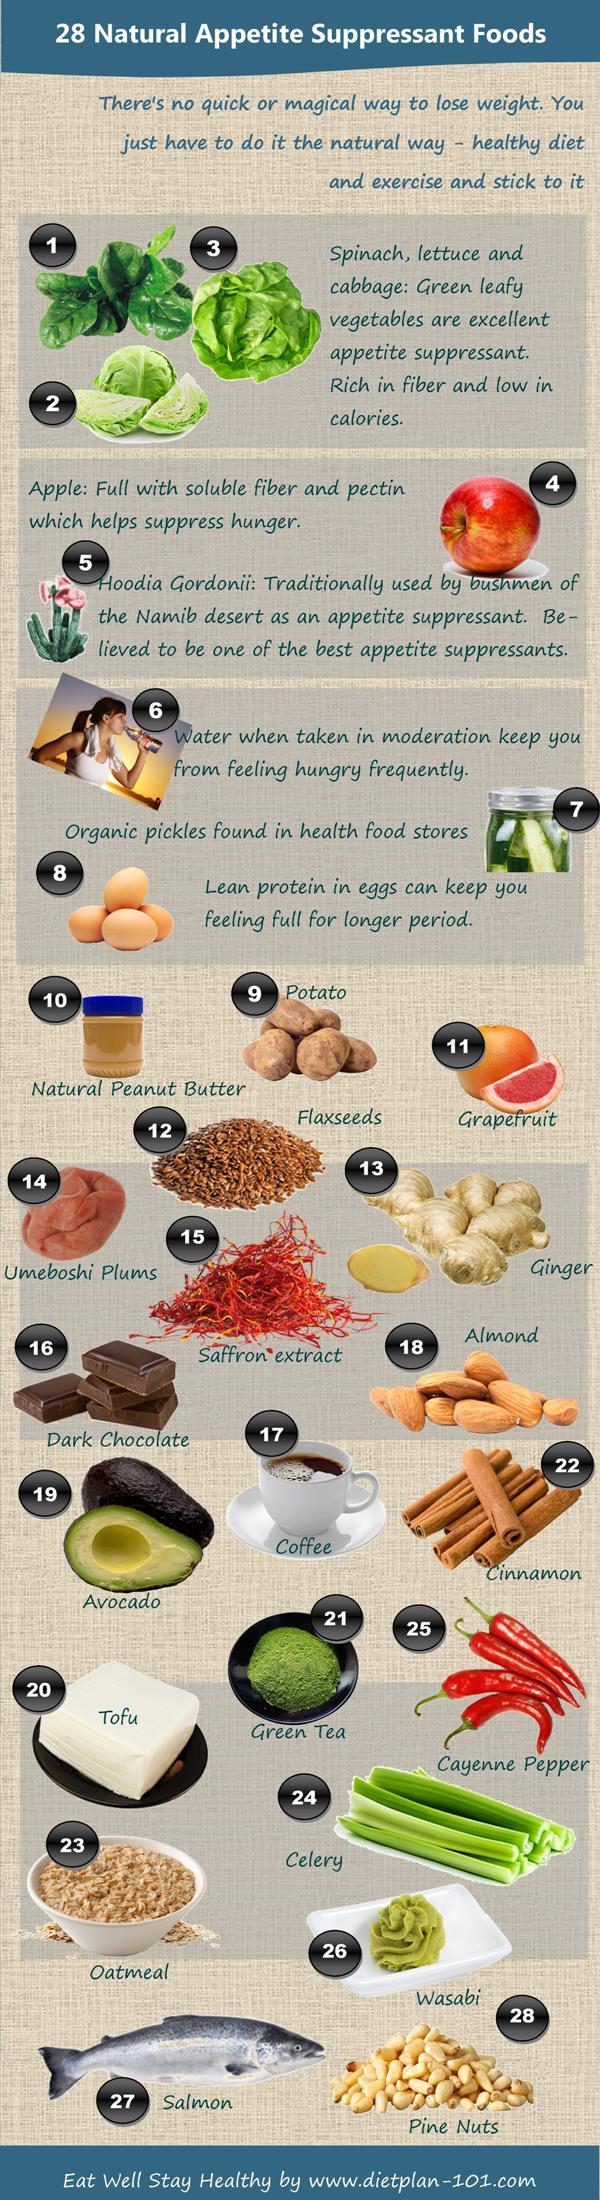 28 Natural Appetite Suppressant Food